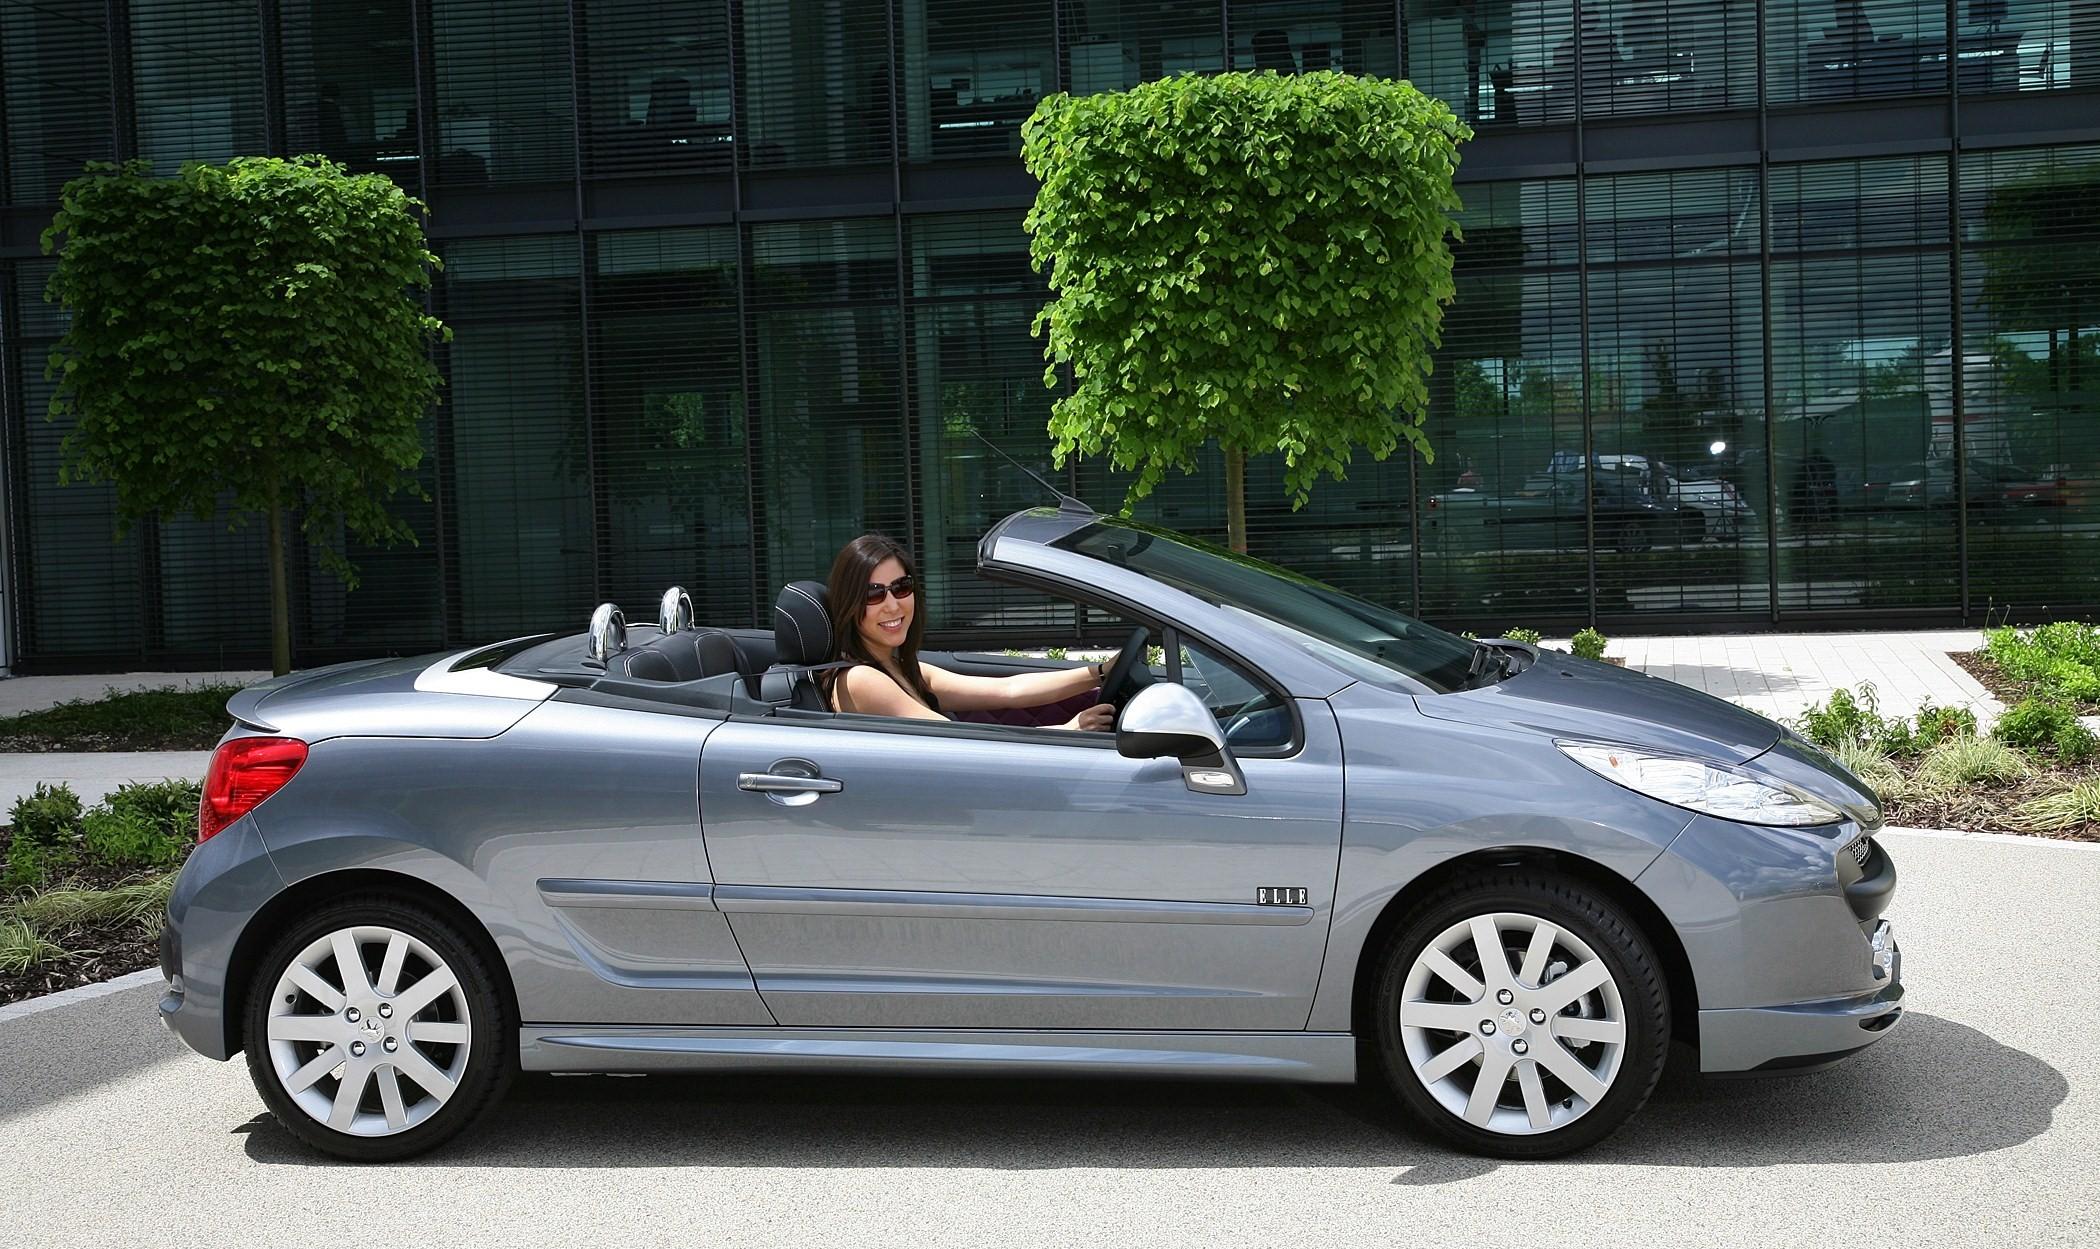 Peugeot 207 Cc Elle Struts Its Stuff For Summer 2008